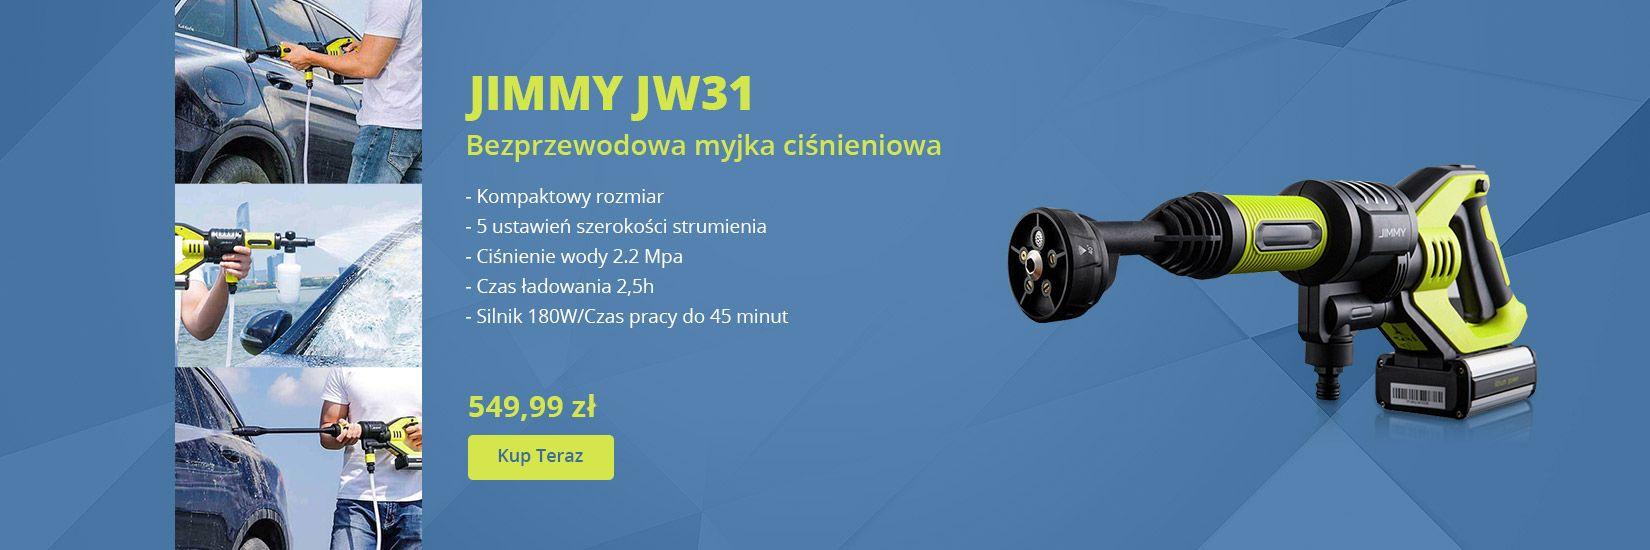 JIMMY JW31